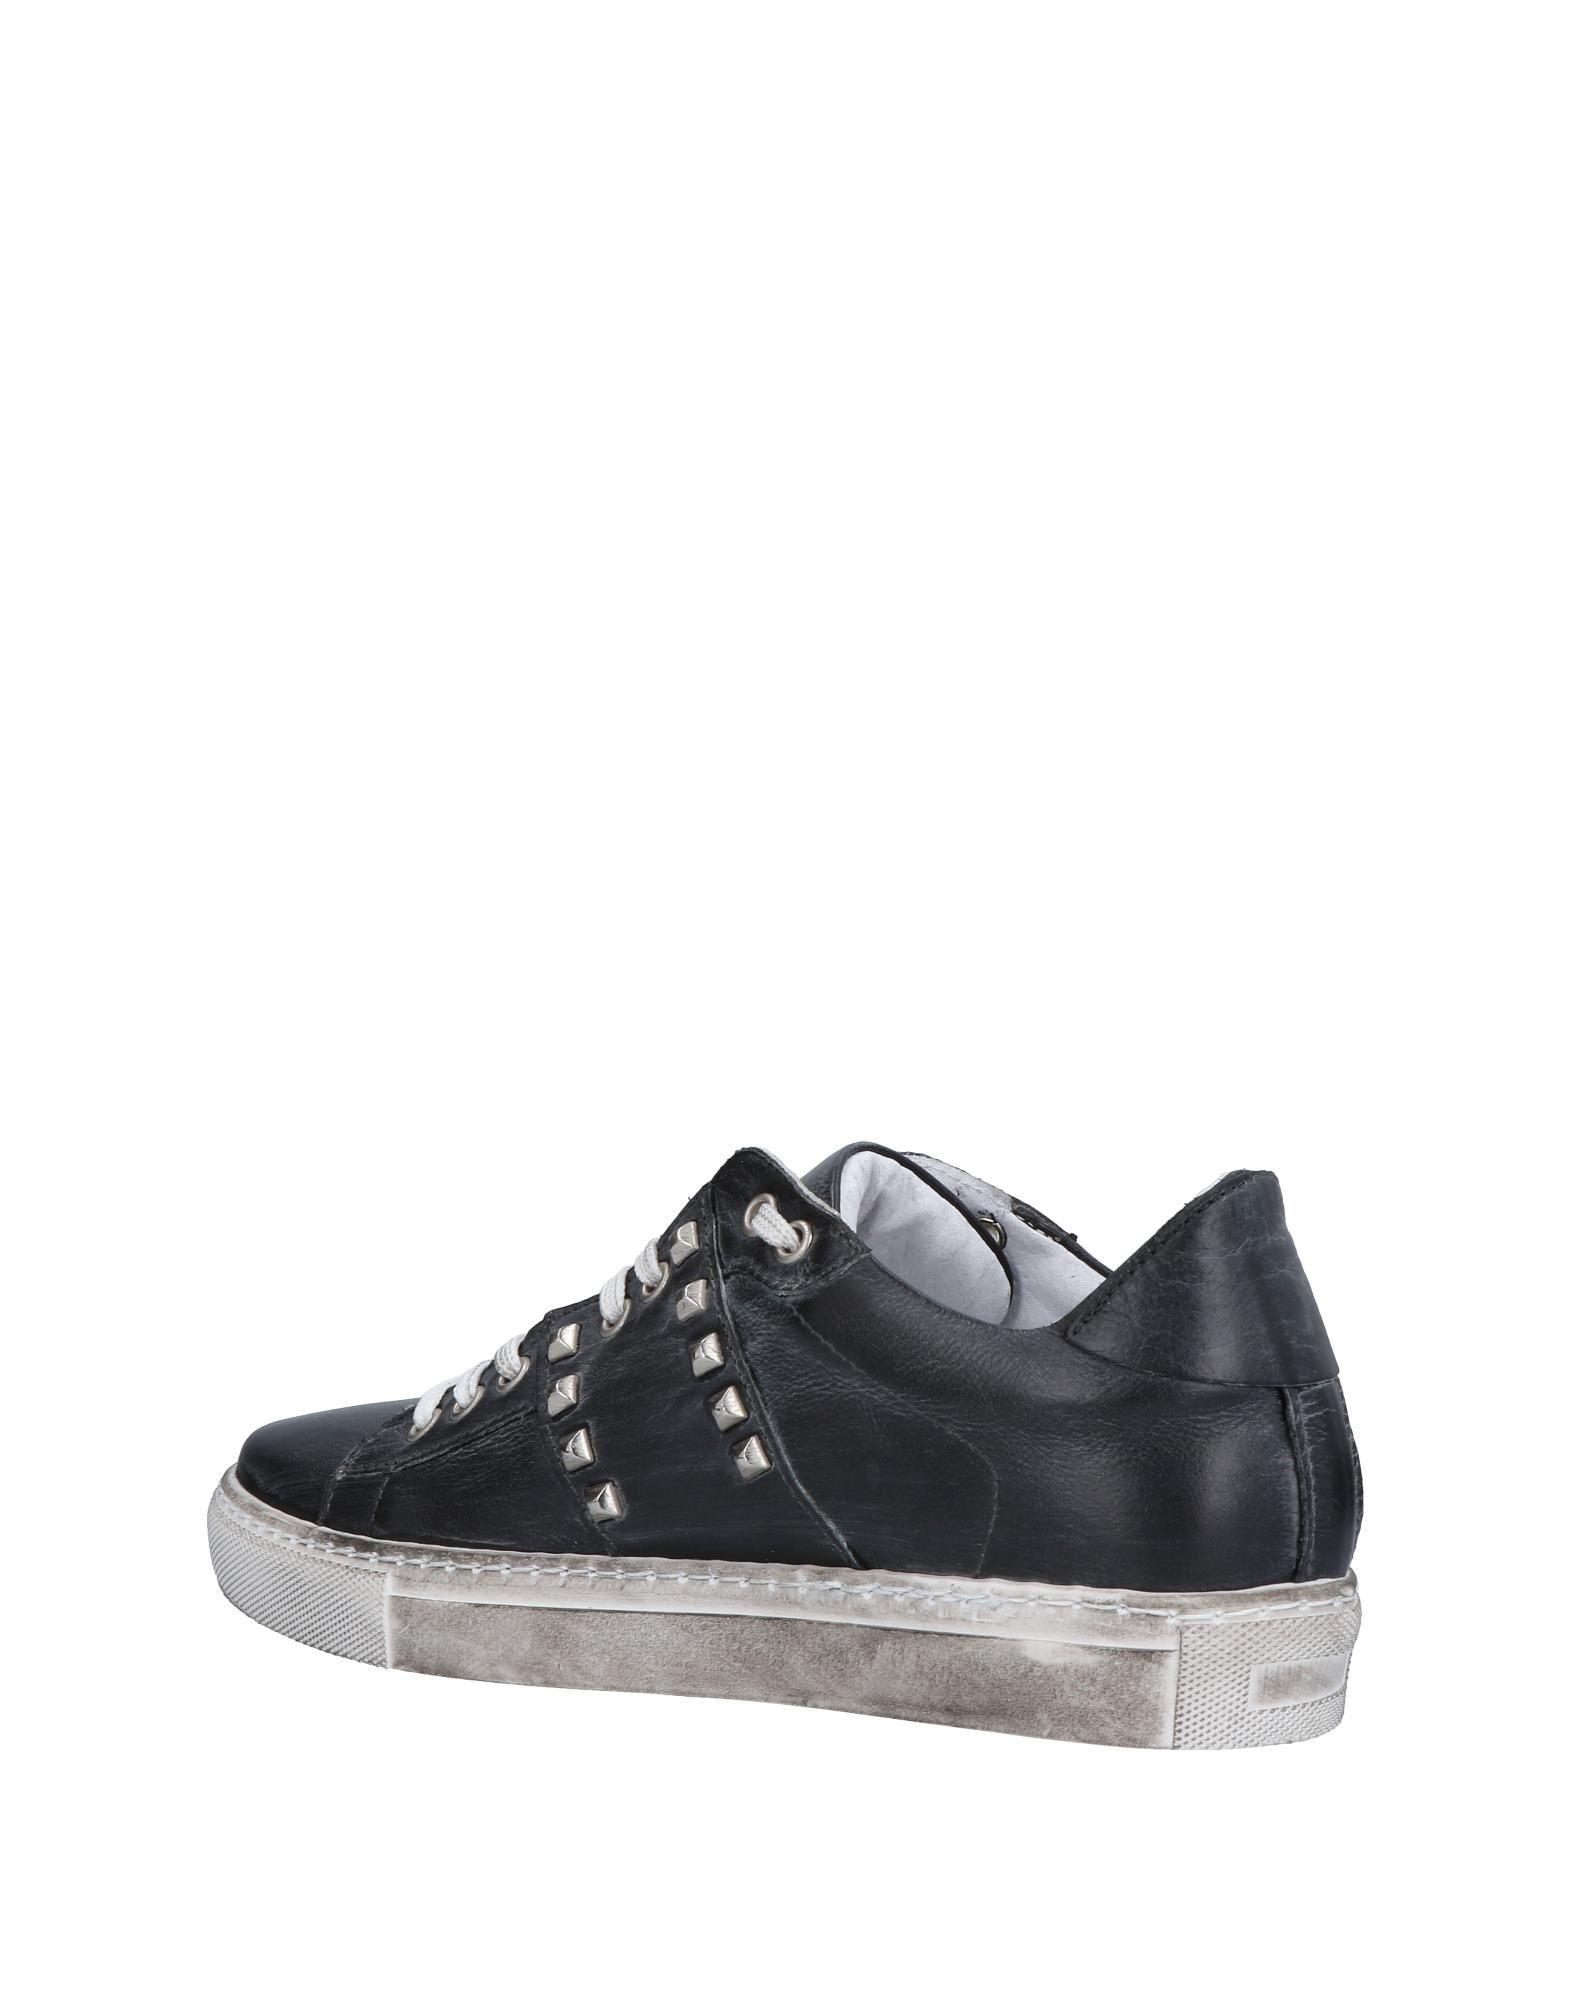 Riccianera Sneakers Damen   Damen 11487087AS  5ffa29